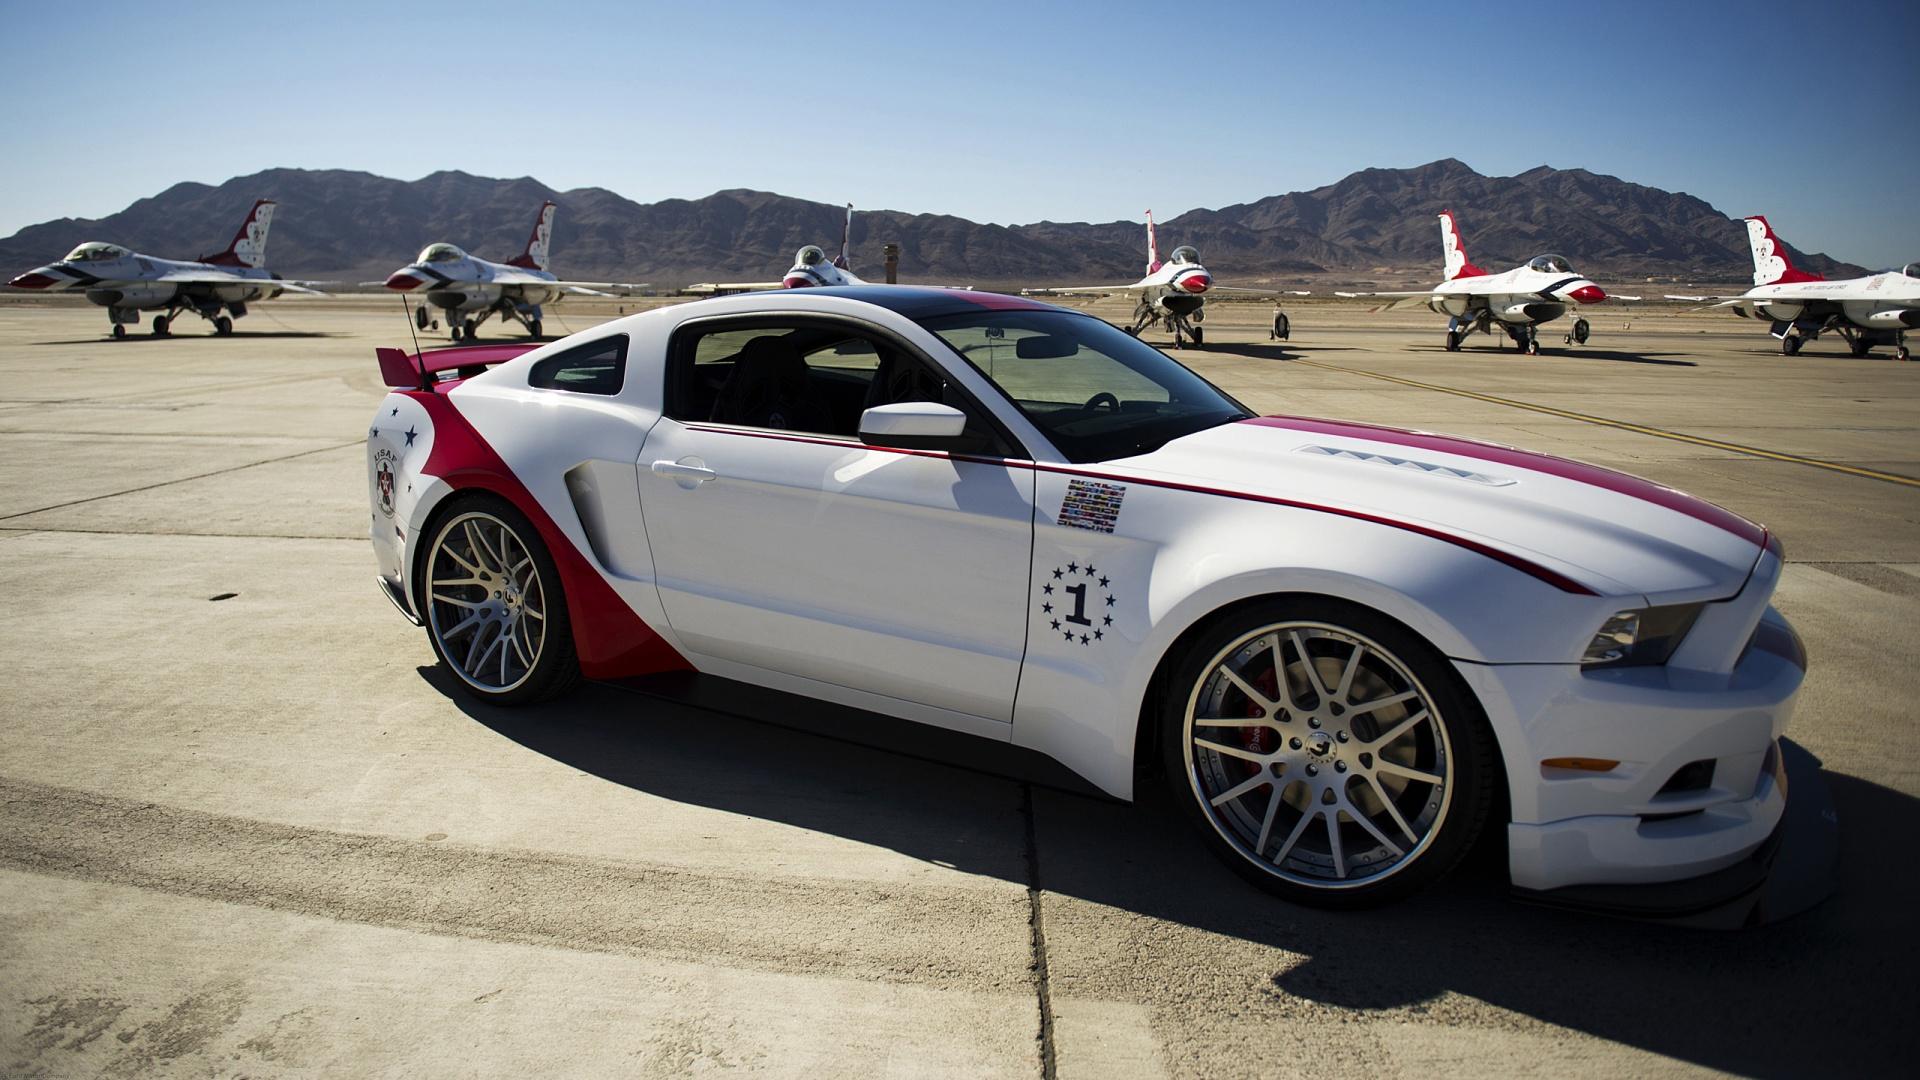 GT US Air Force Thunderbirds Edition 2 Wallpaper HD Car Wallpapers 1920x1080